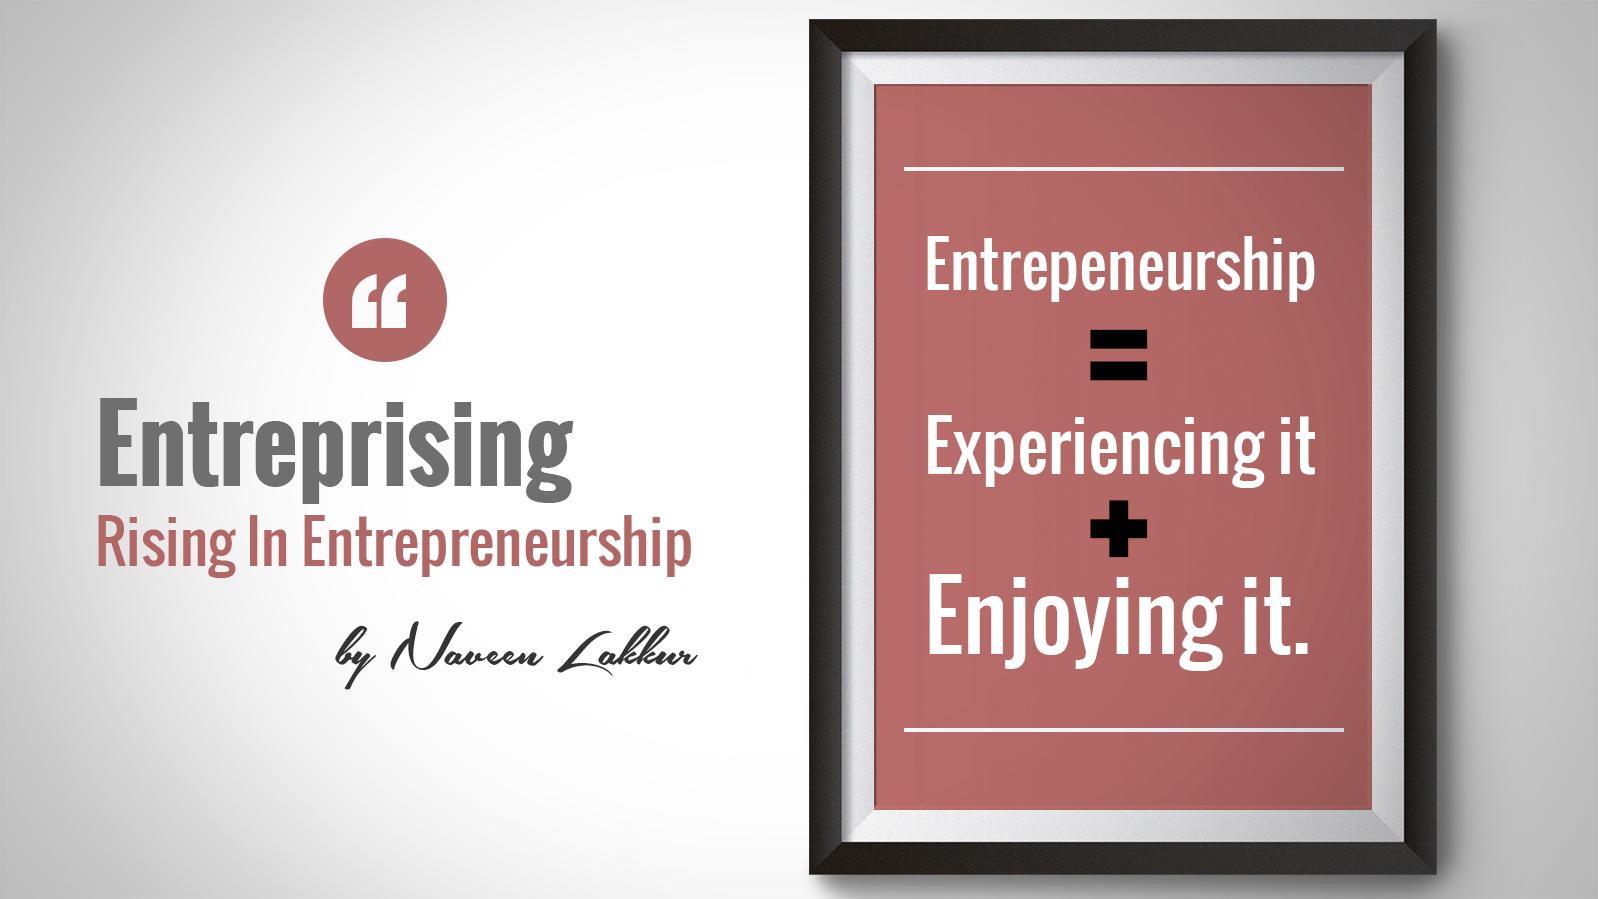 Enjoy the Entrepreneurship Experience